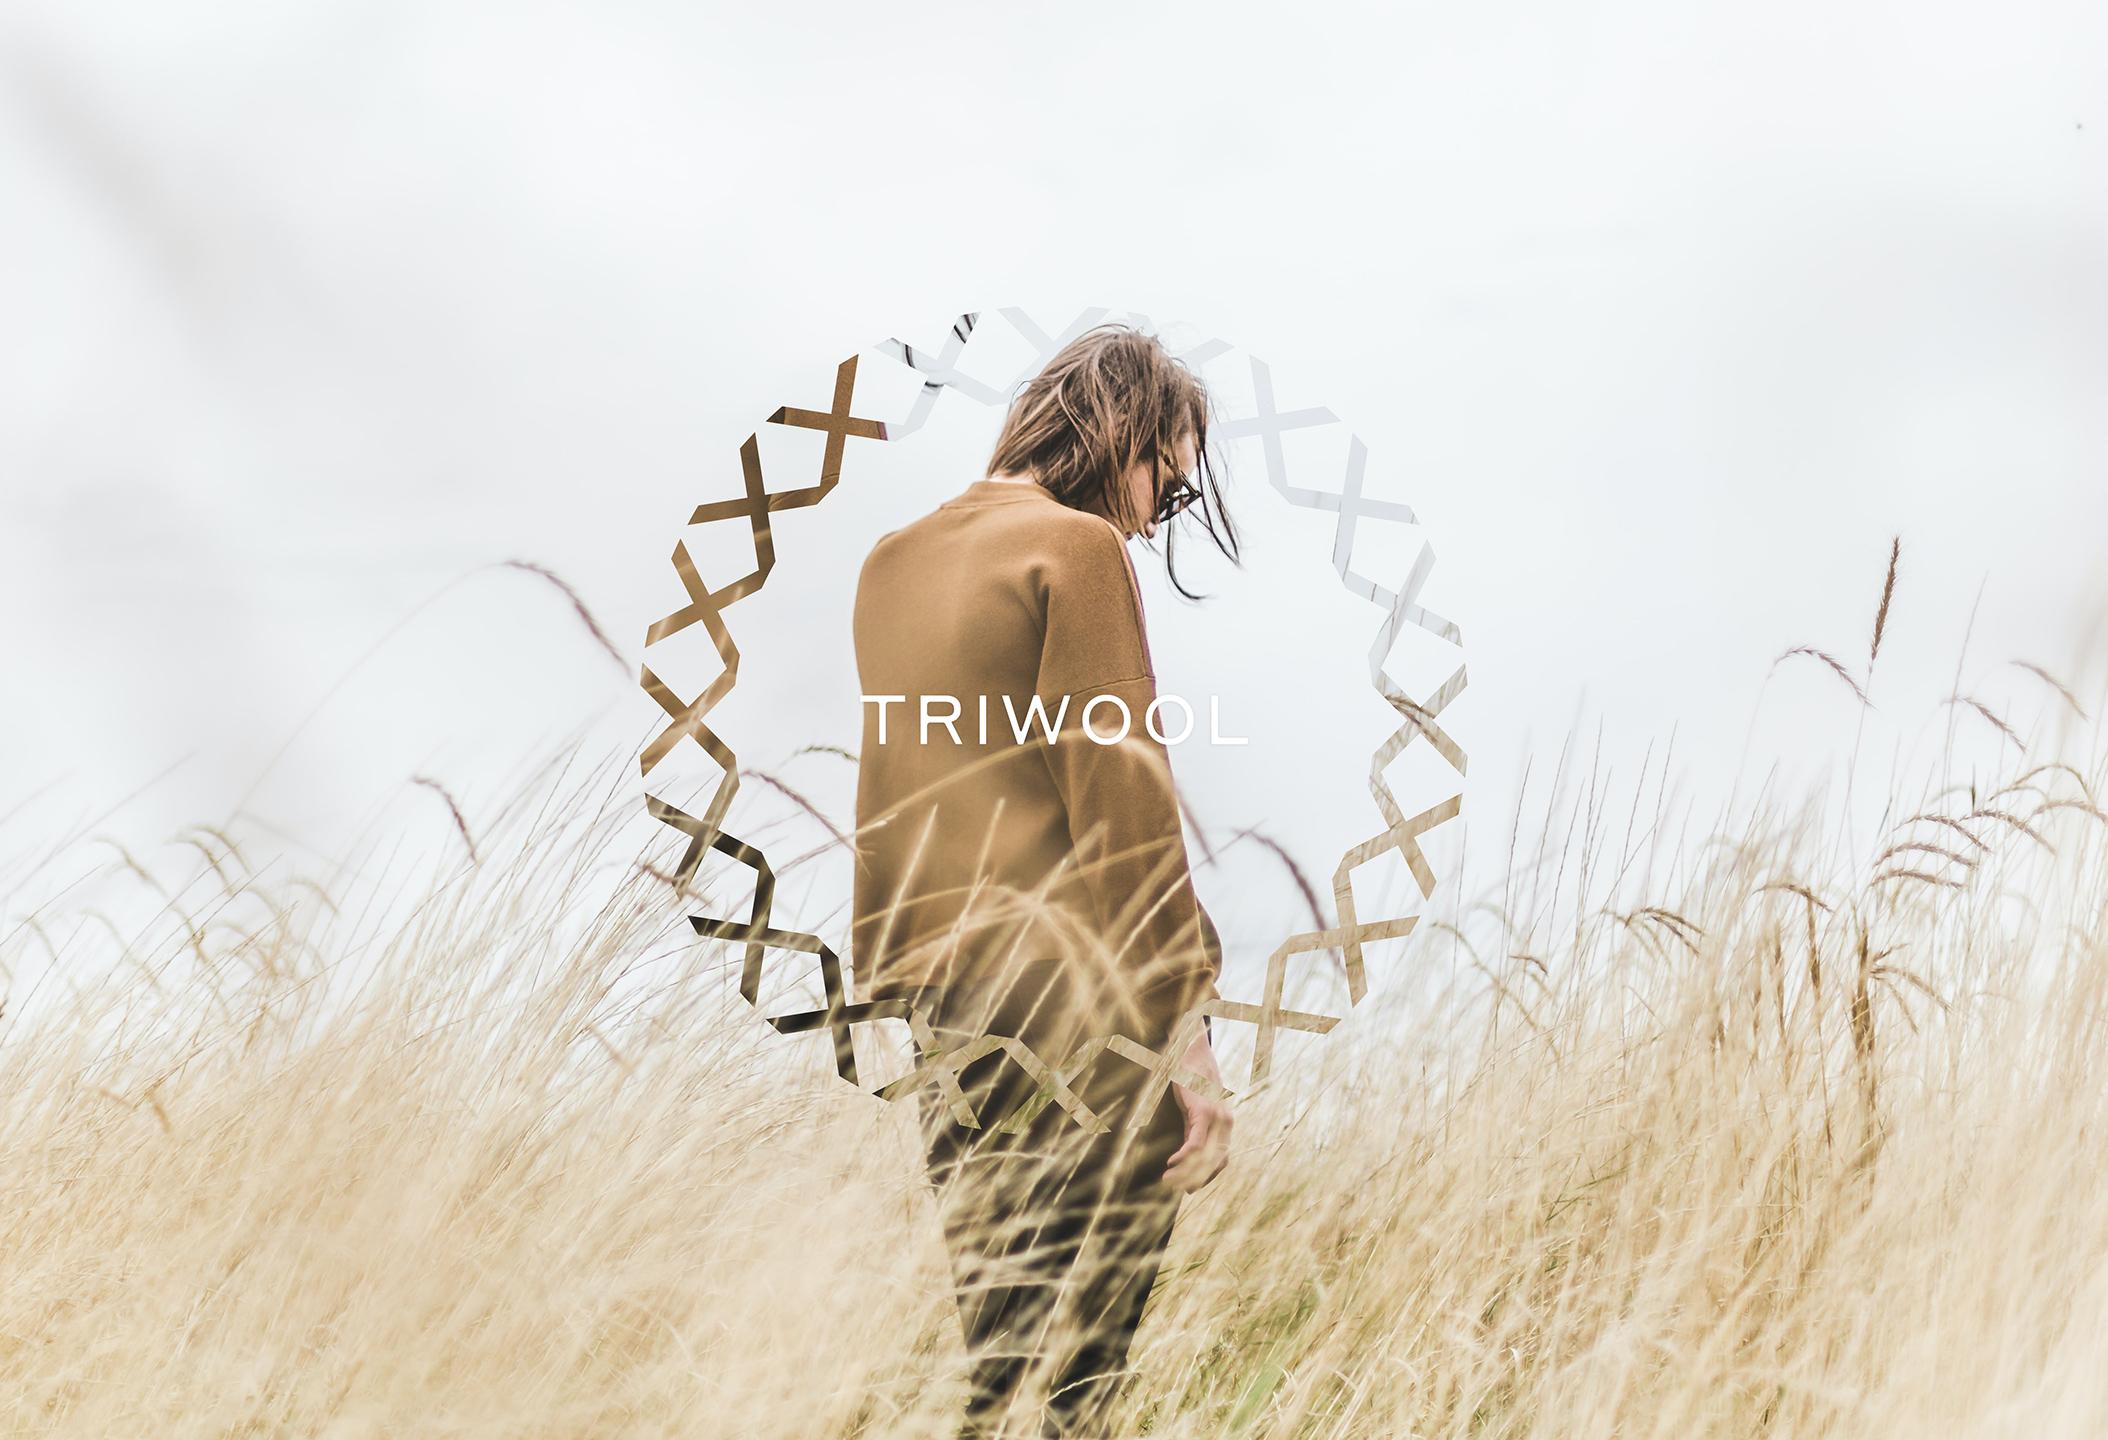 Volta Studio Creates Triwool's Brand Identity